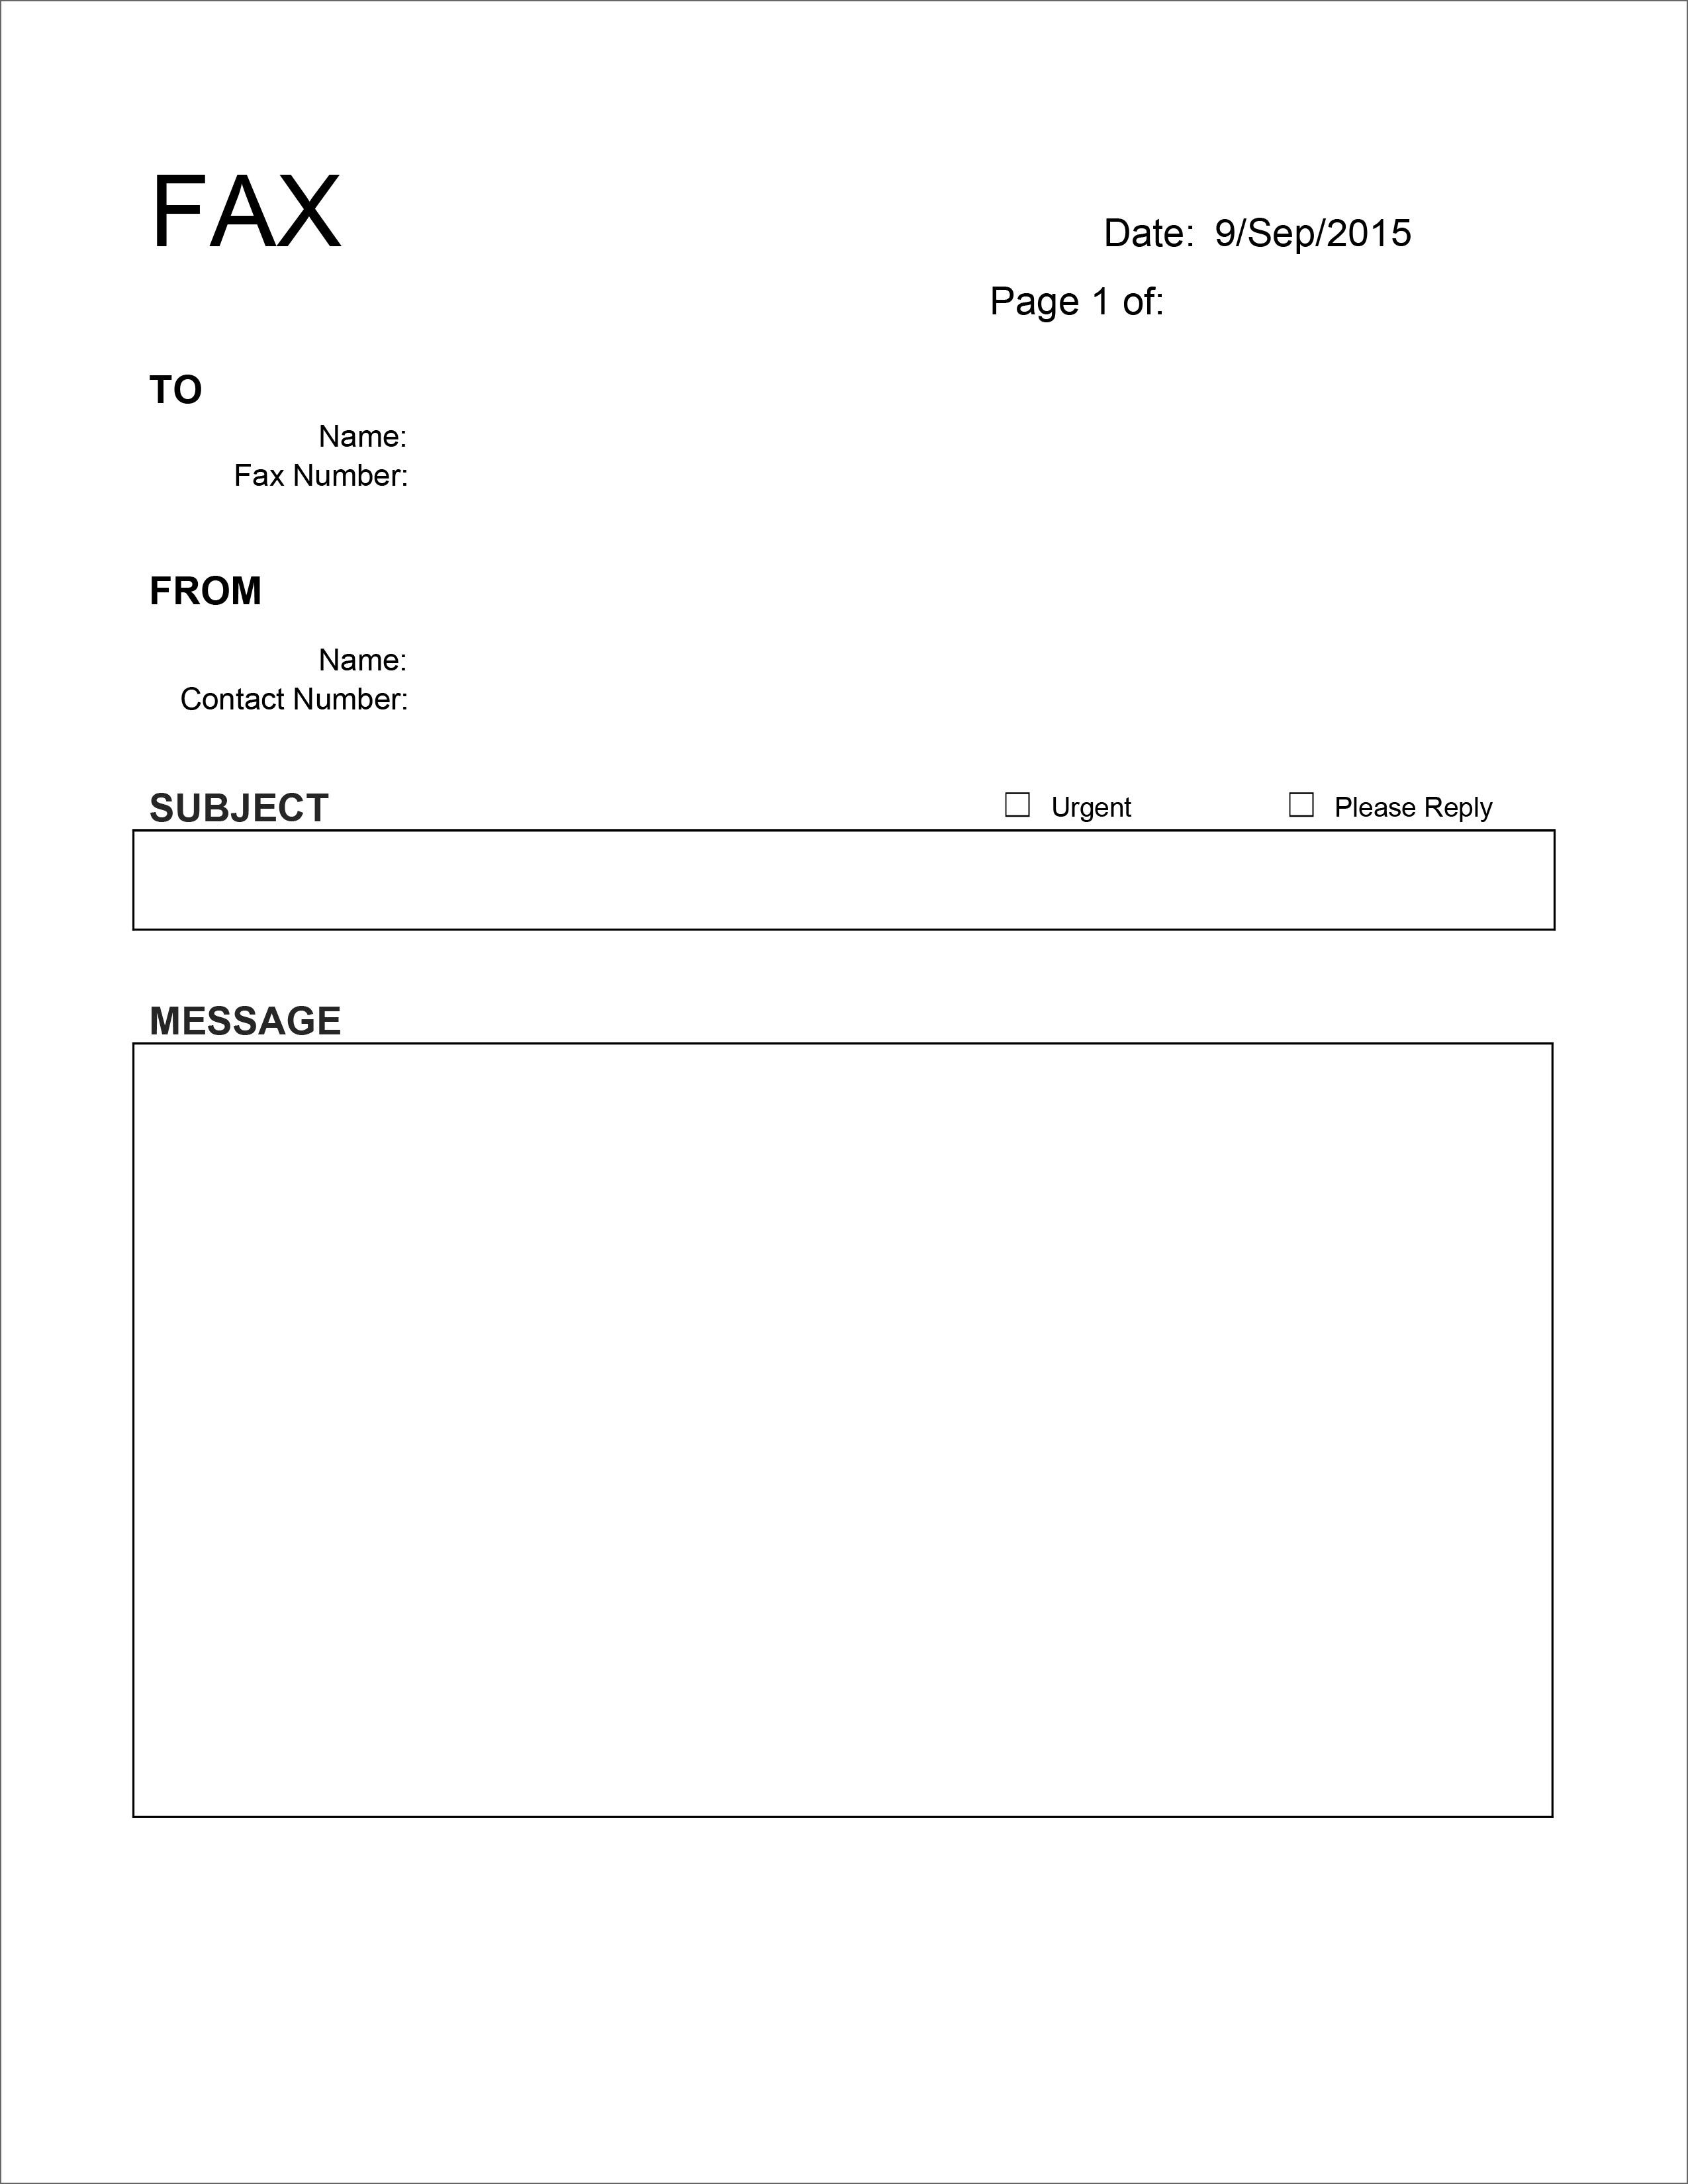 fax using google docs